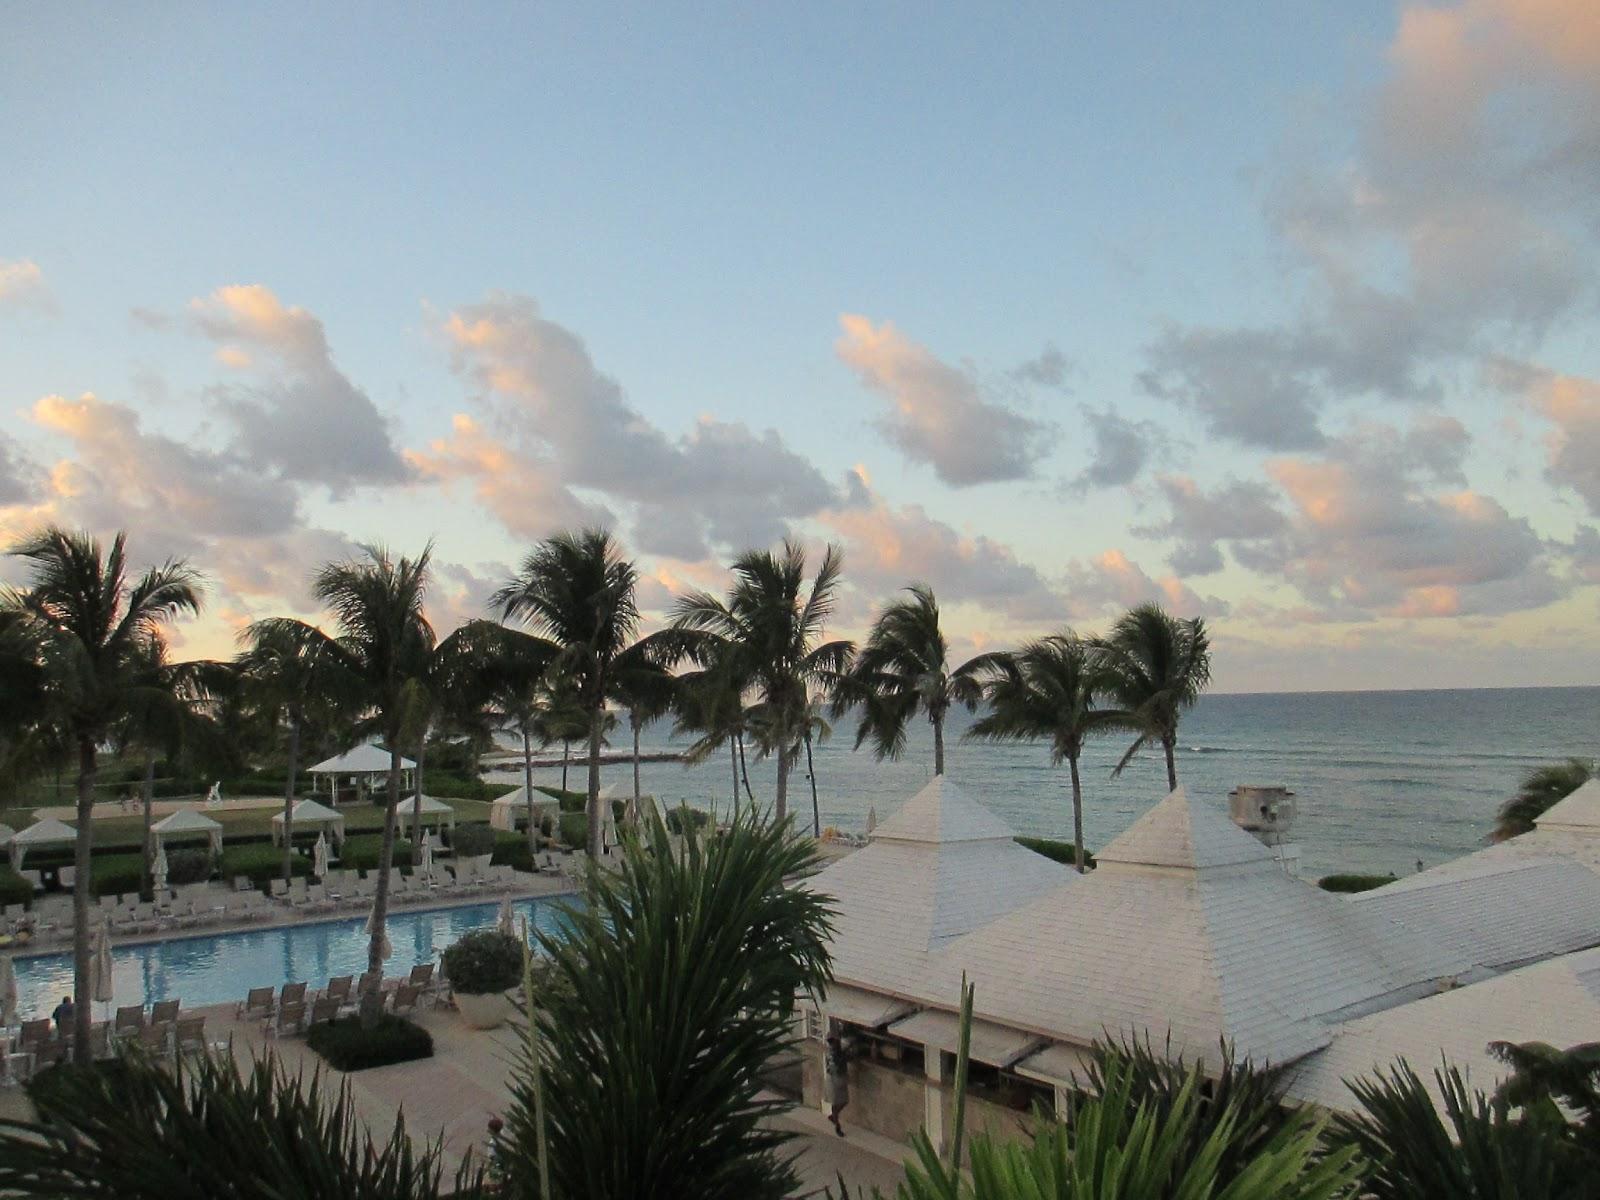 Hilton Rose Hotel In Montego Bay Jamaica